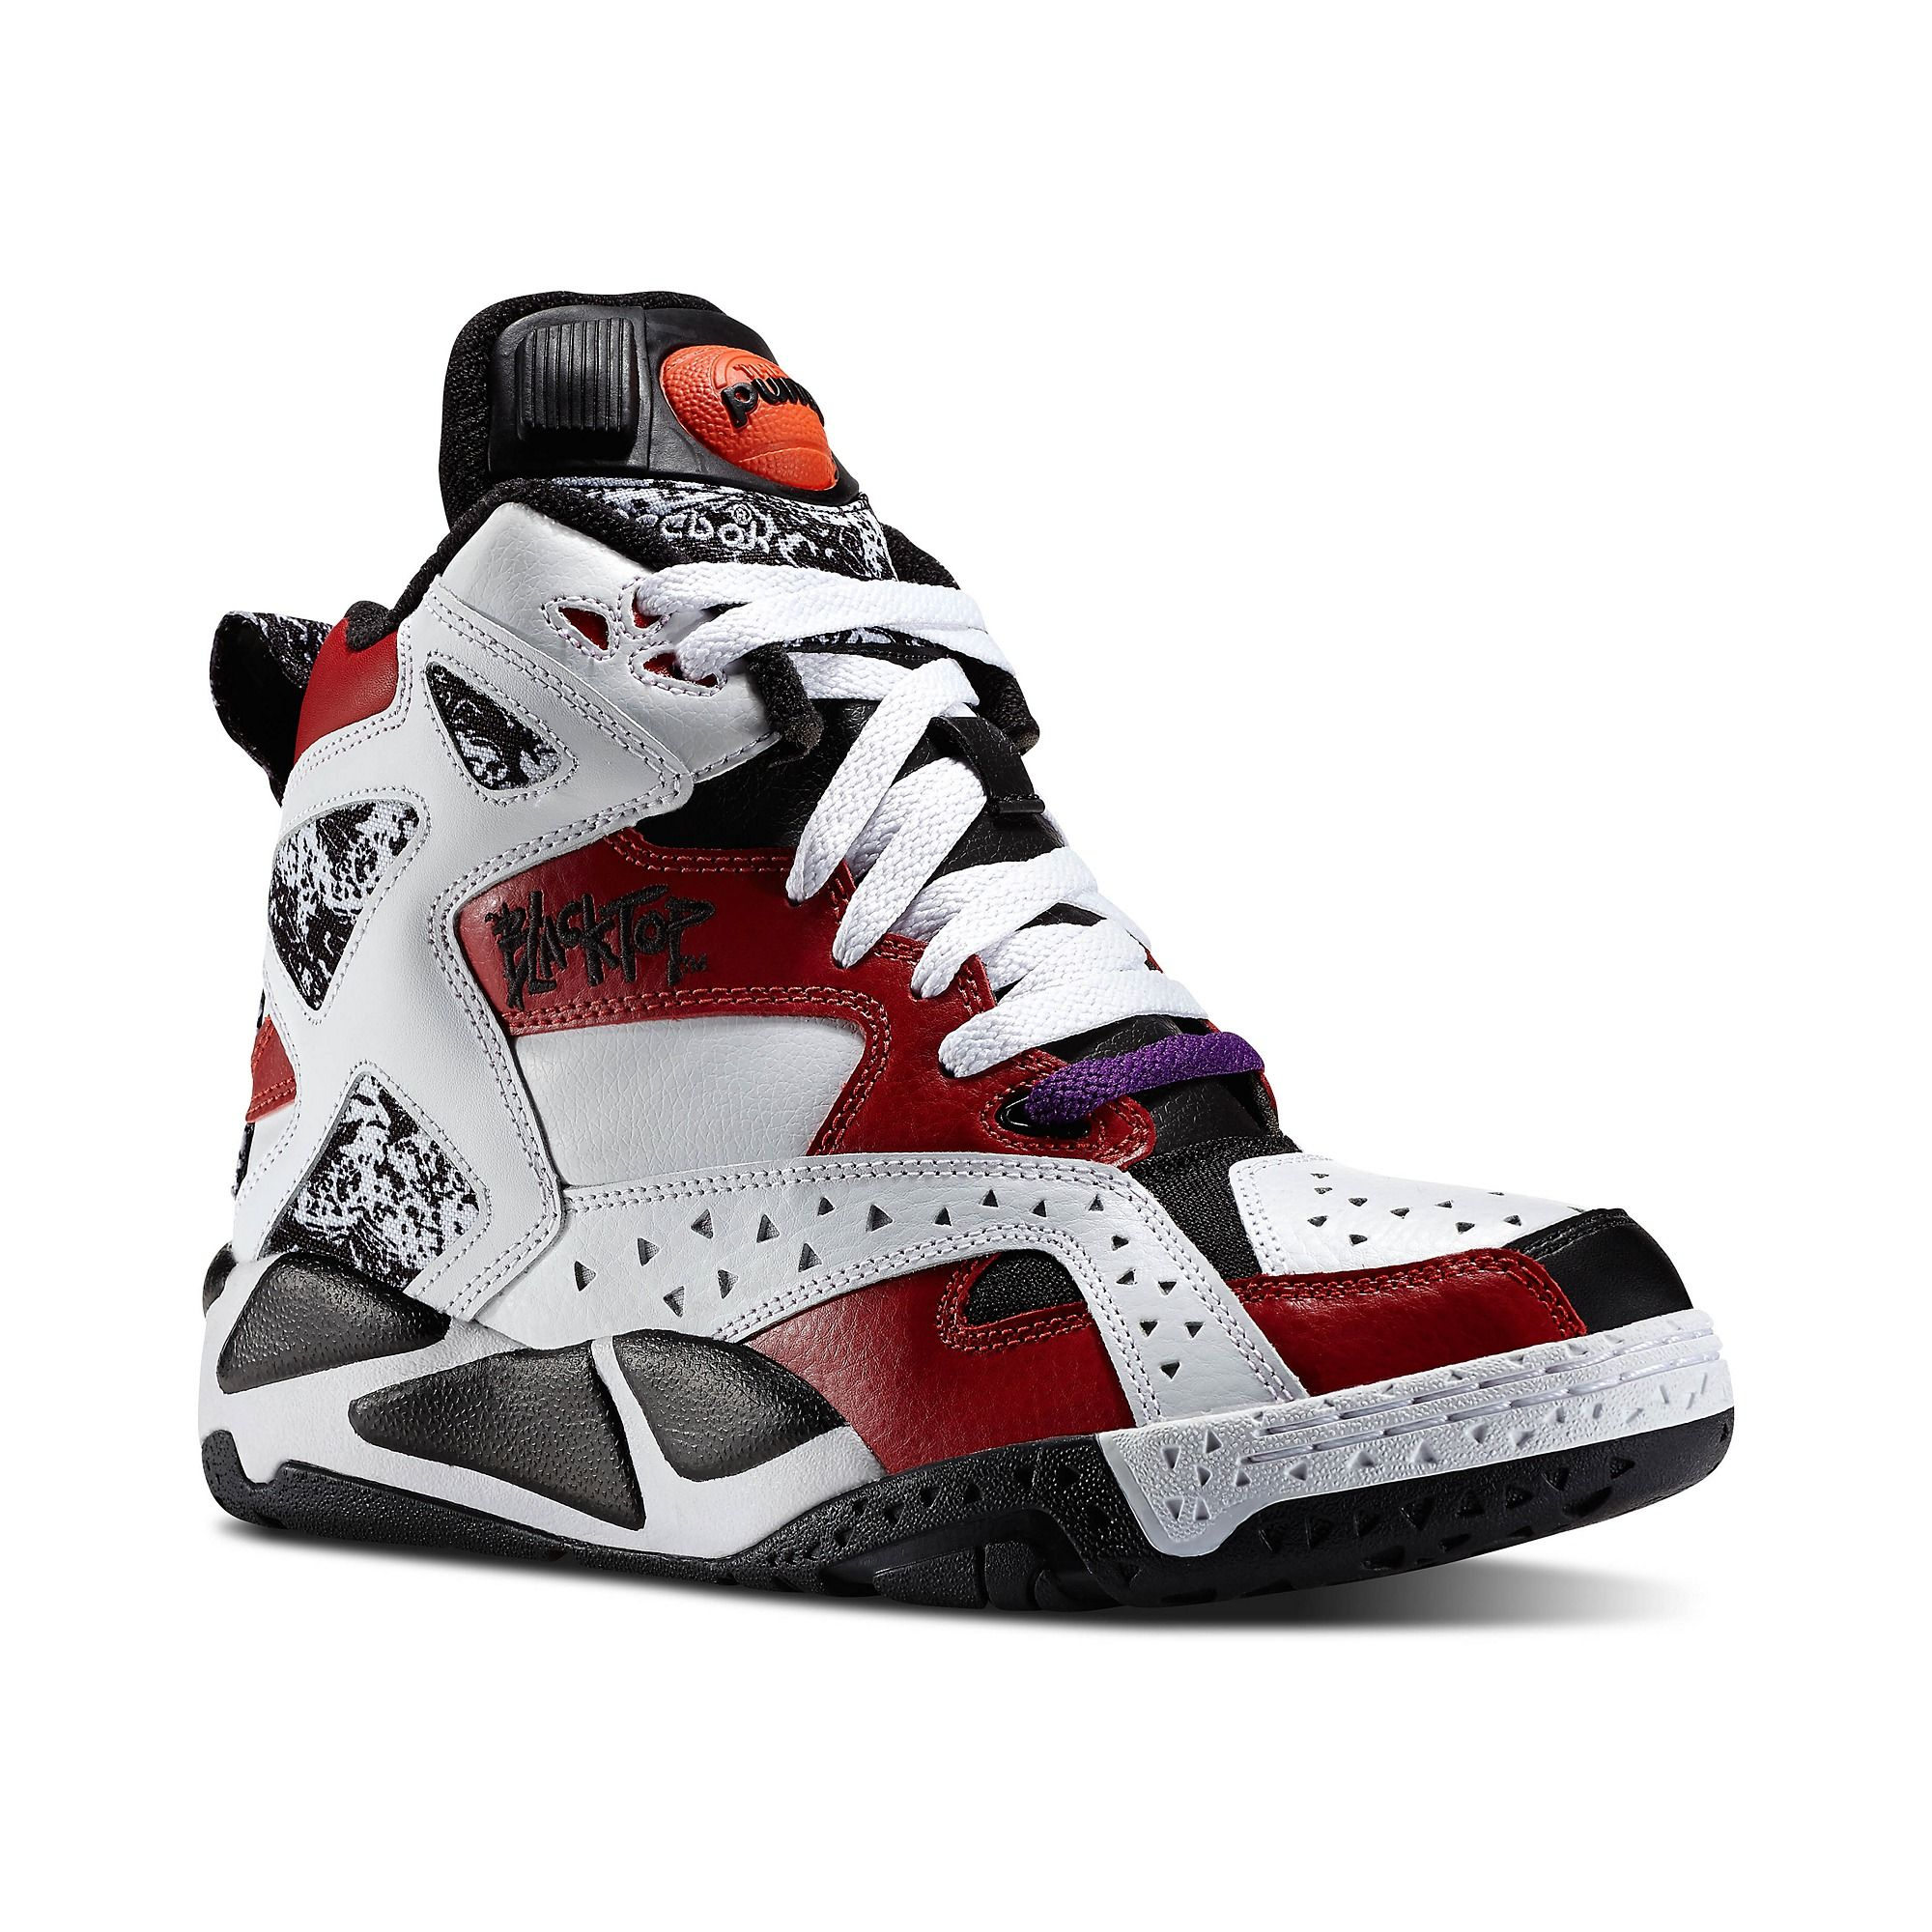 Retro basketball shoes, Sneakers men